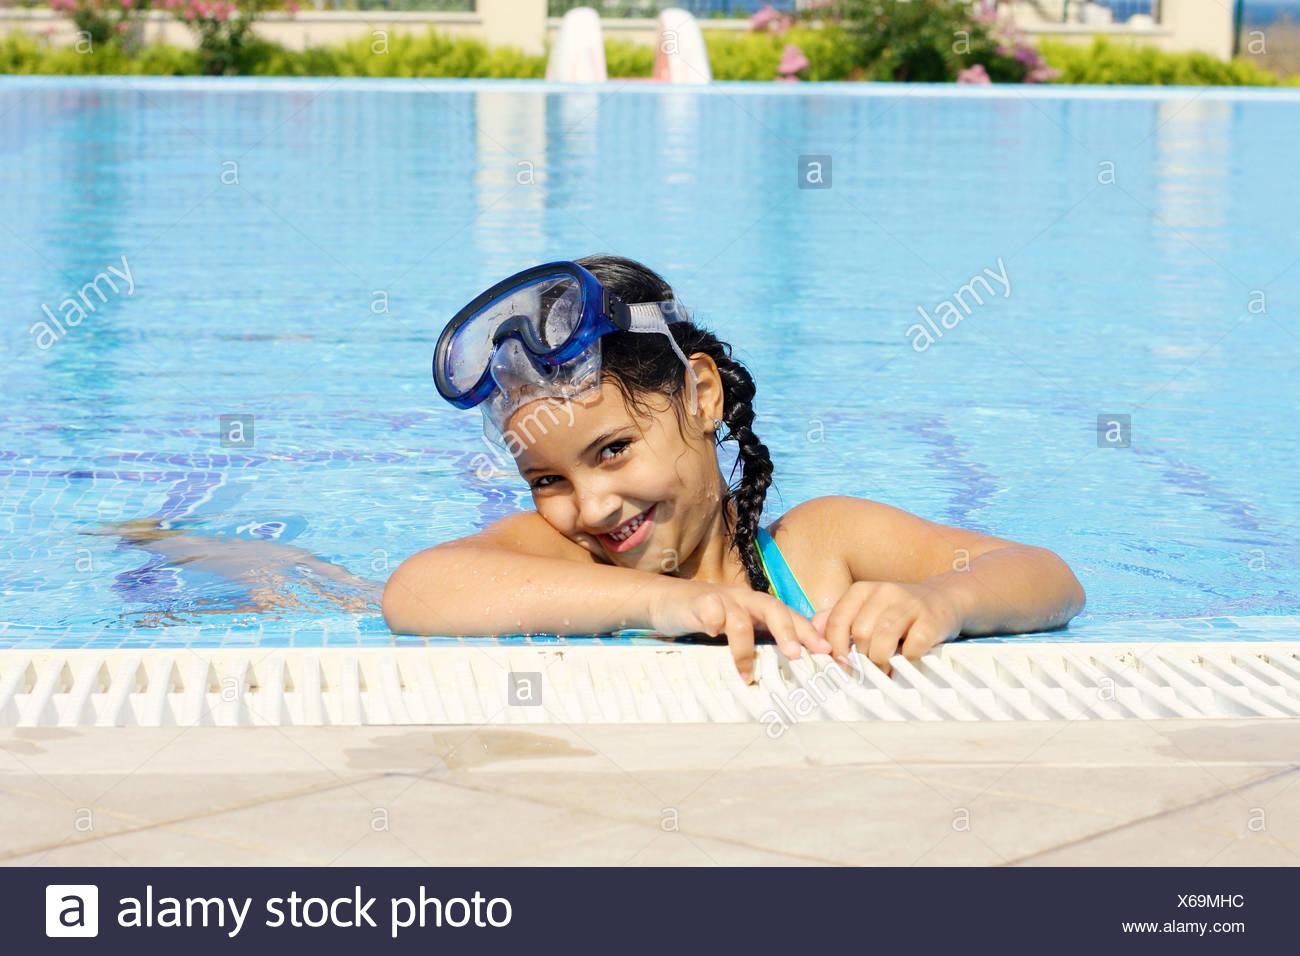 Carino sorridente bambina (6-7) avente fun in piscina Immagini Stock